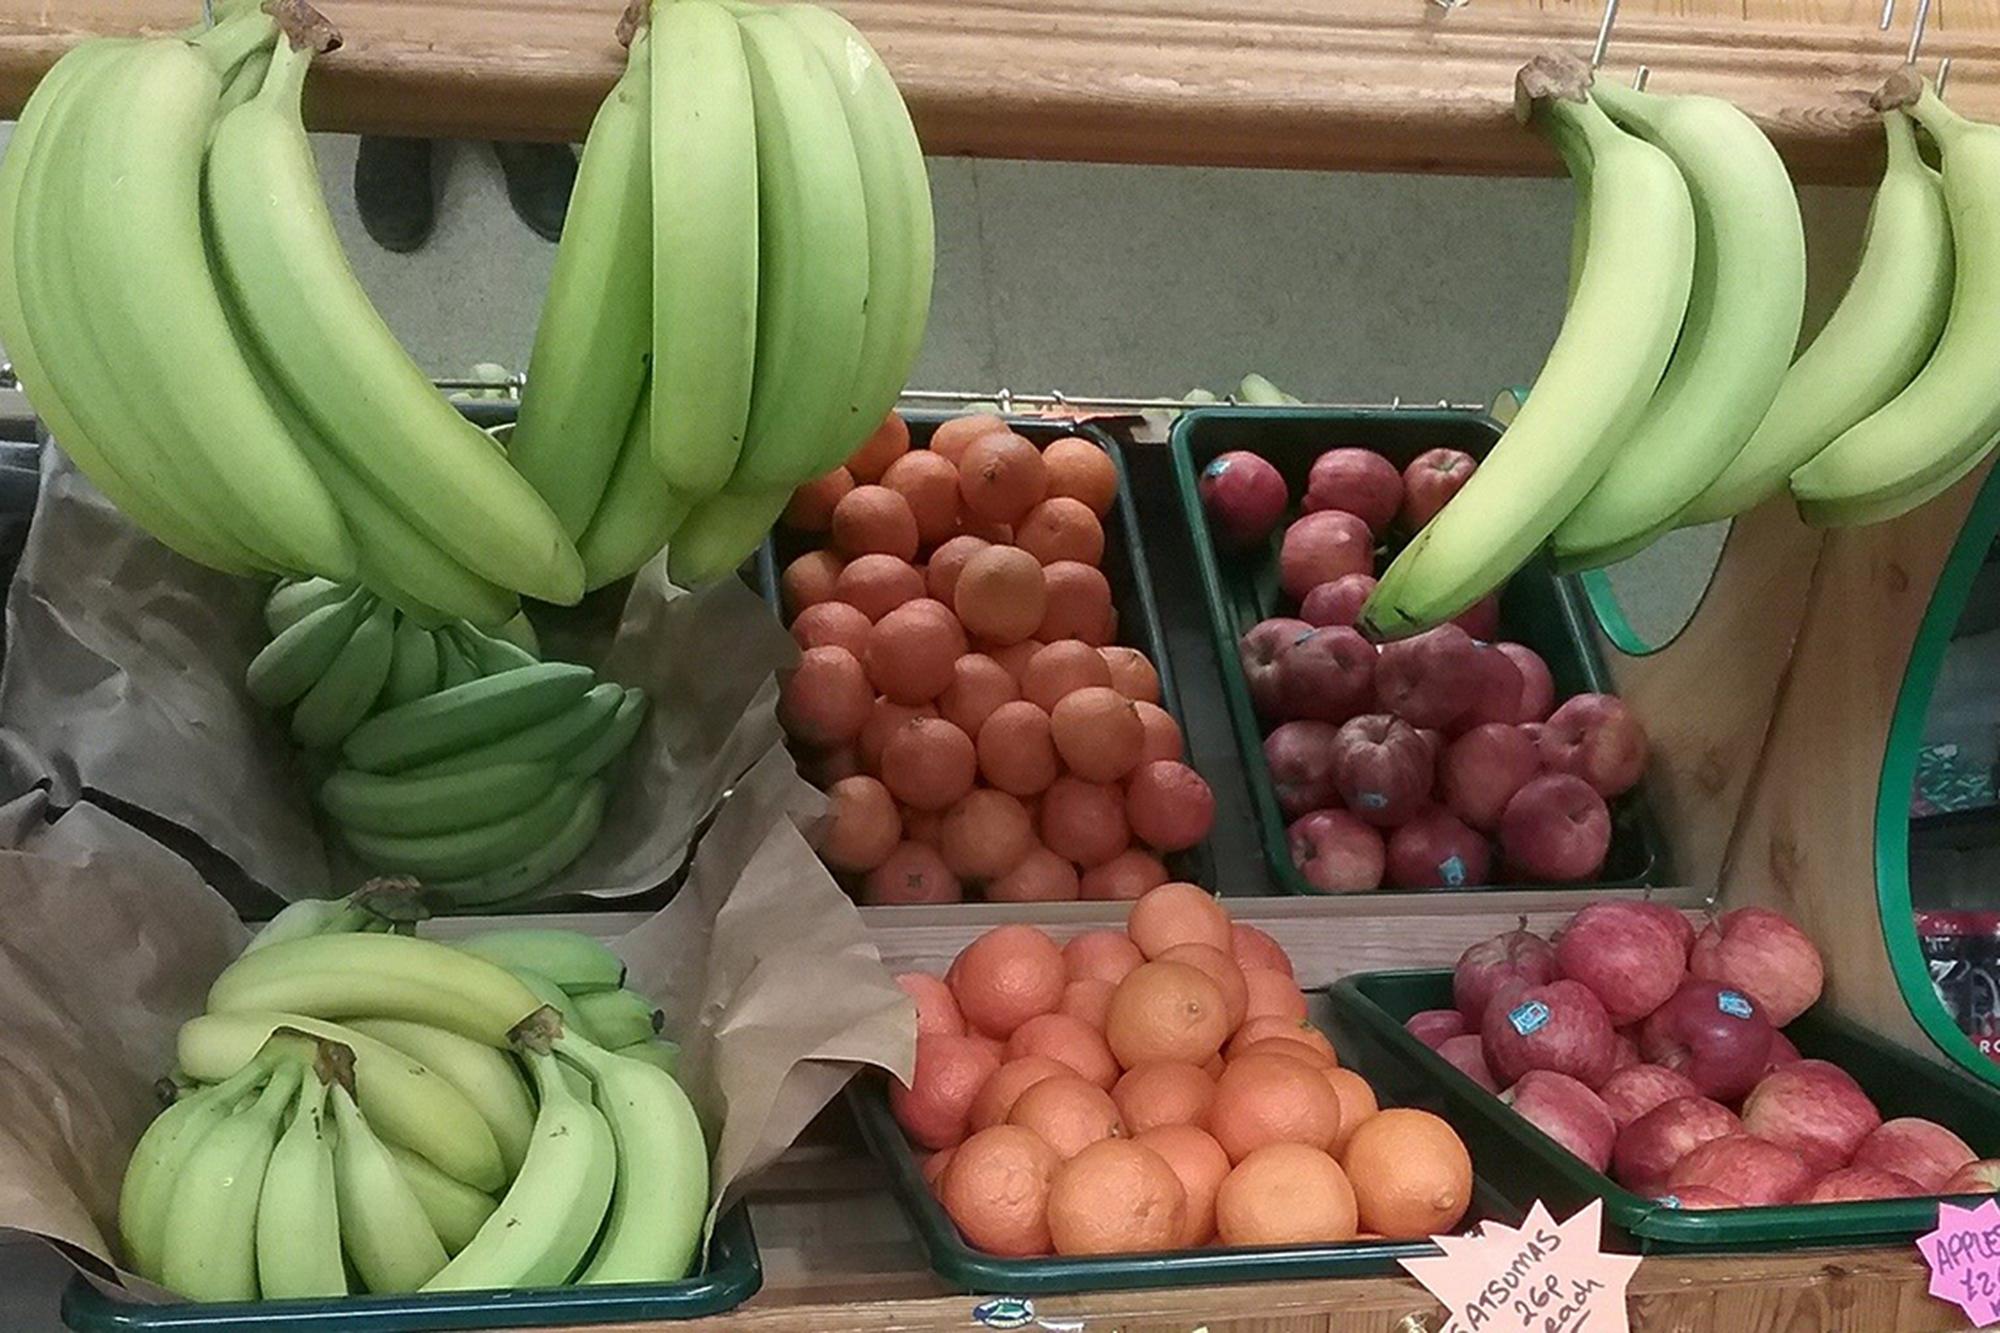 Fruit & Veg Siop Uwchaled 2000x1333px